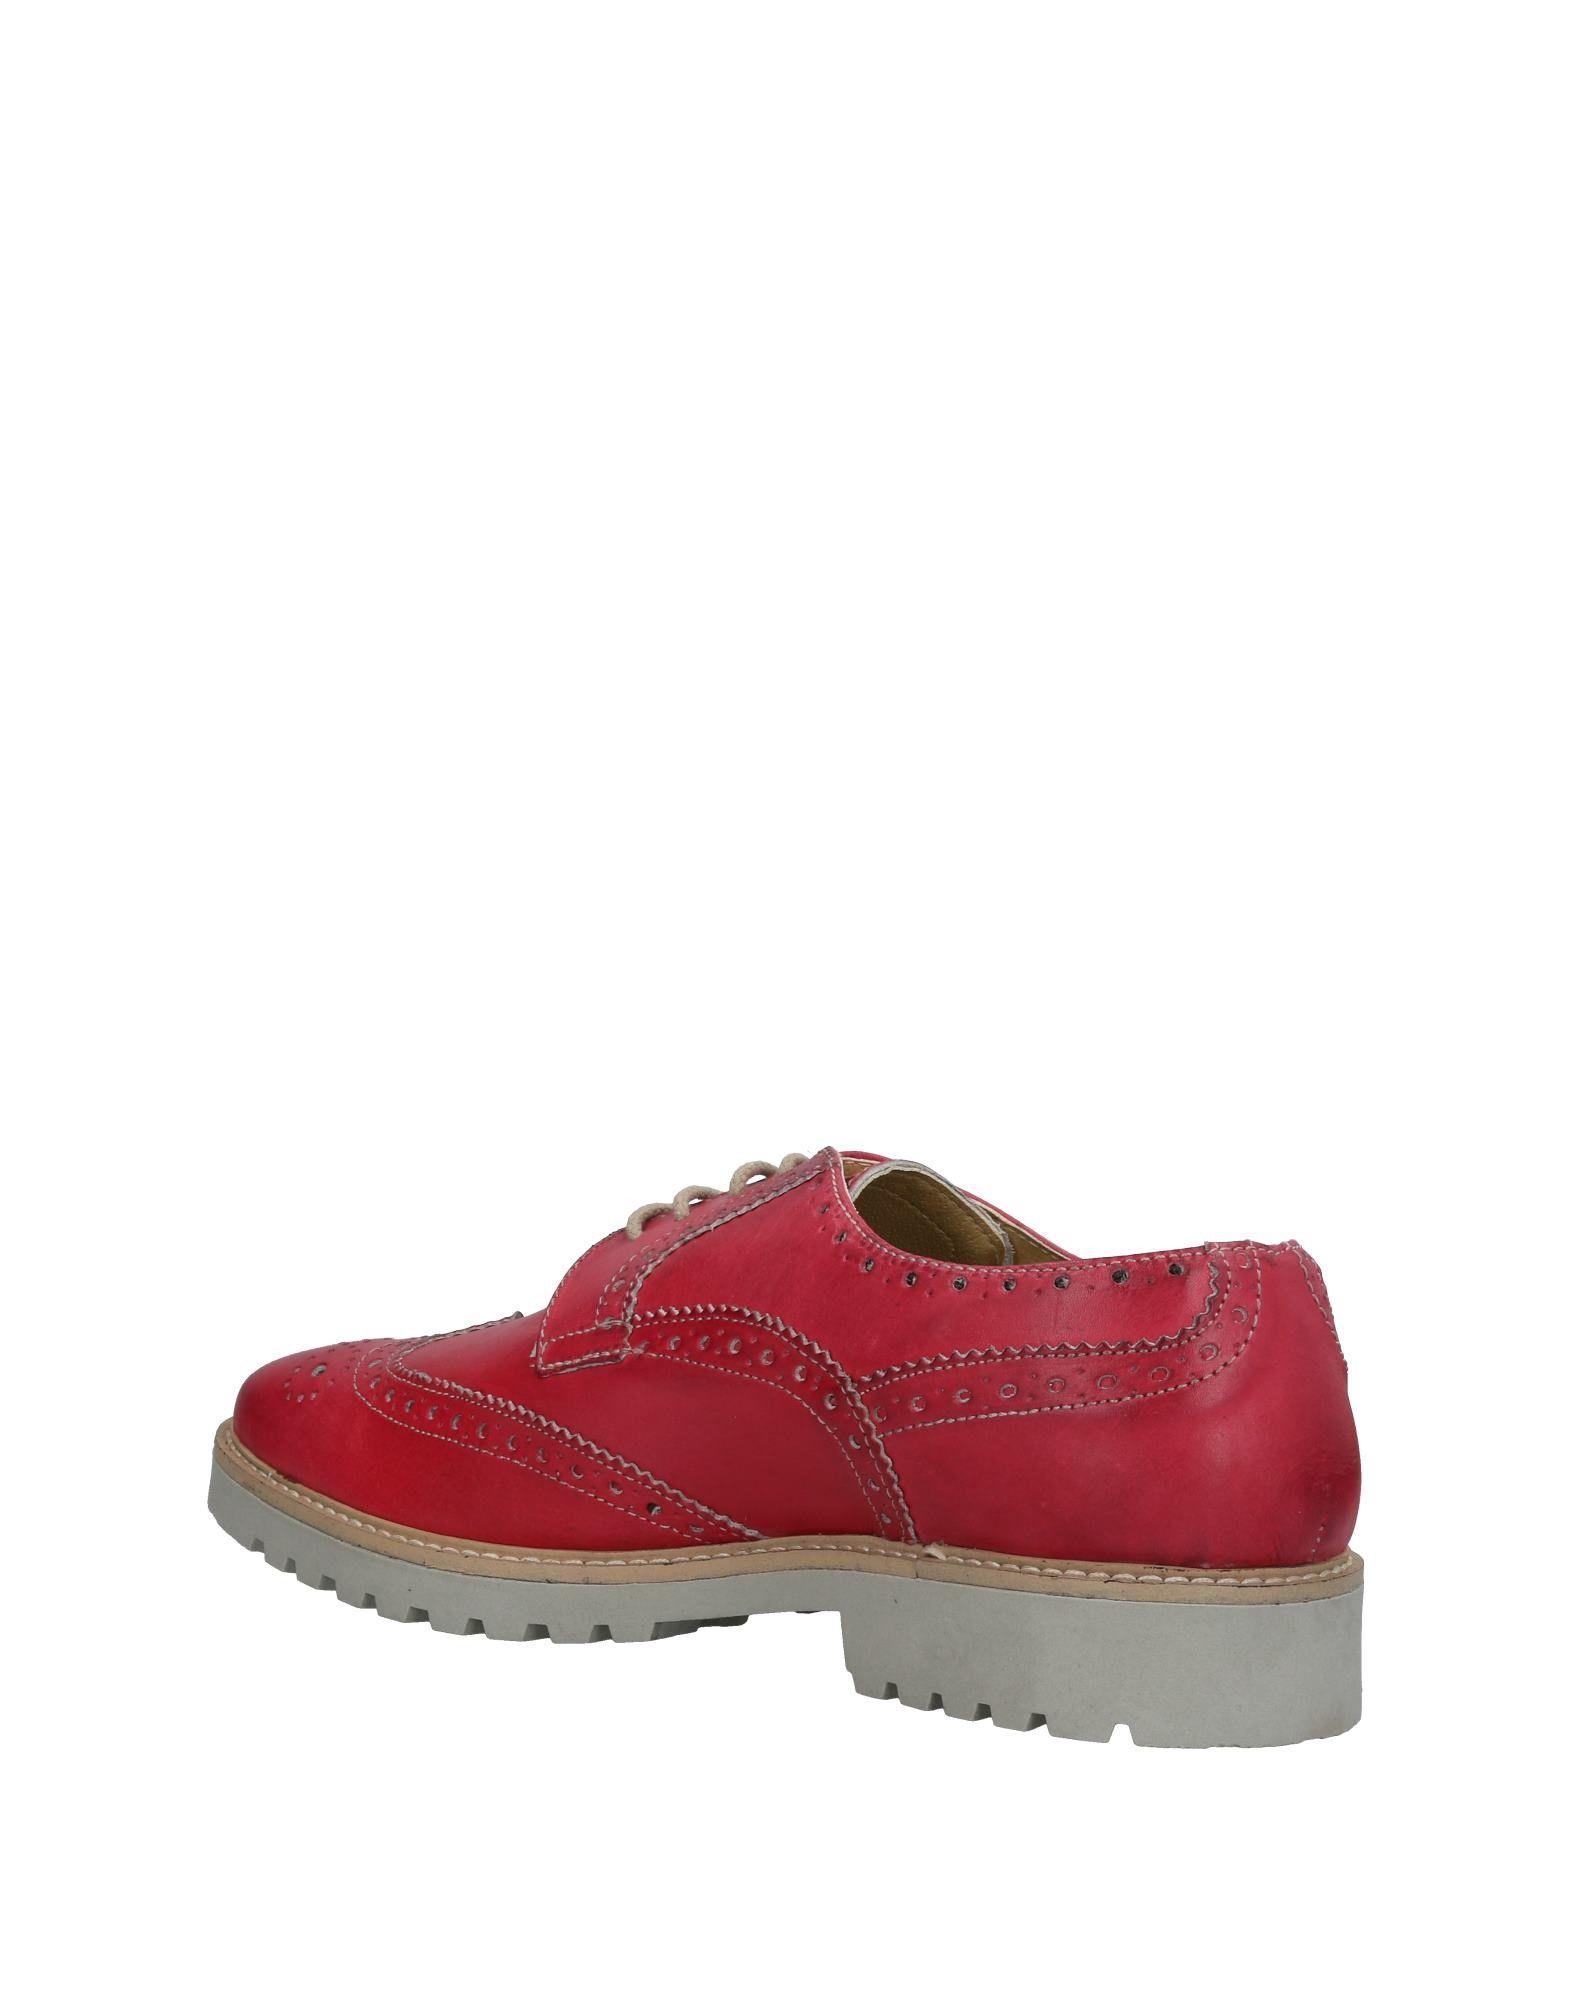 Rabatt echte Schuhe Alexander Trend Schnürschuhe Herren  11418216IR